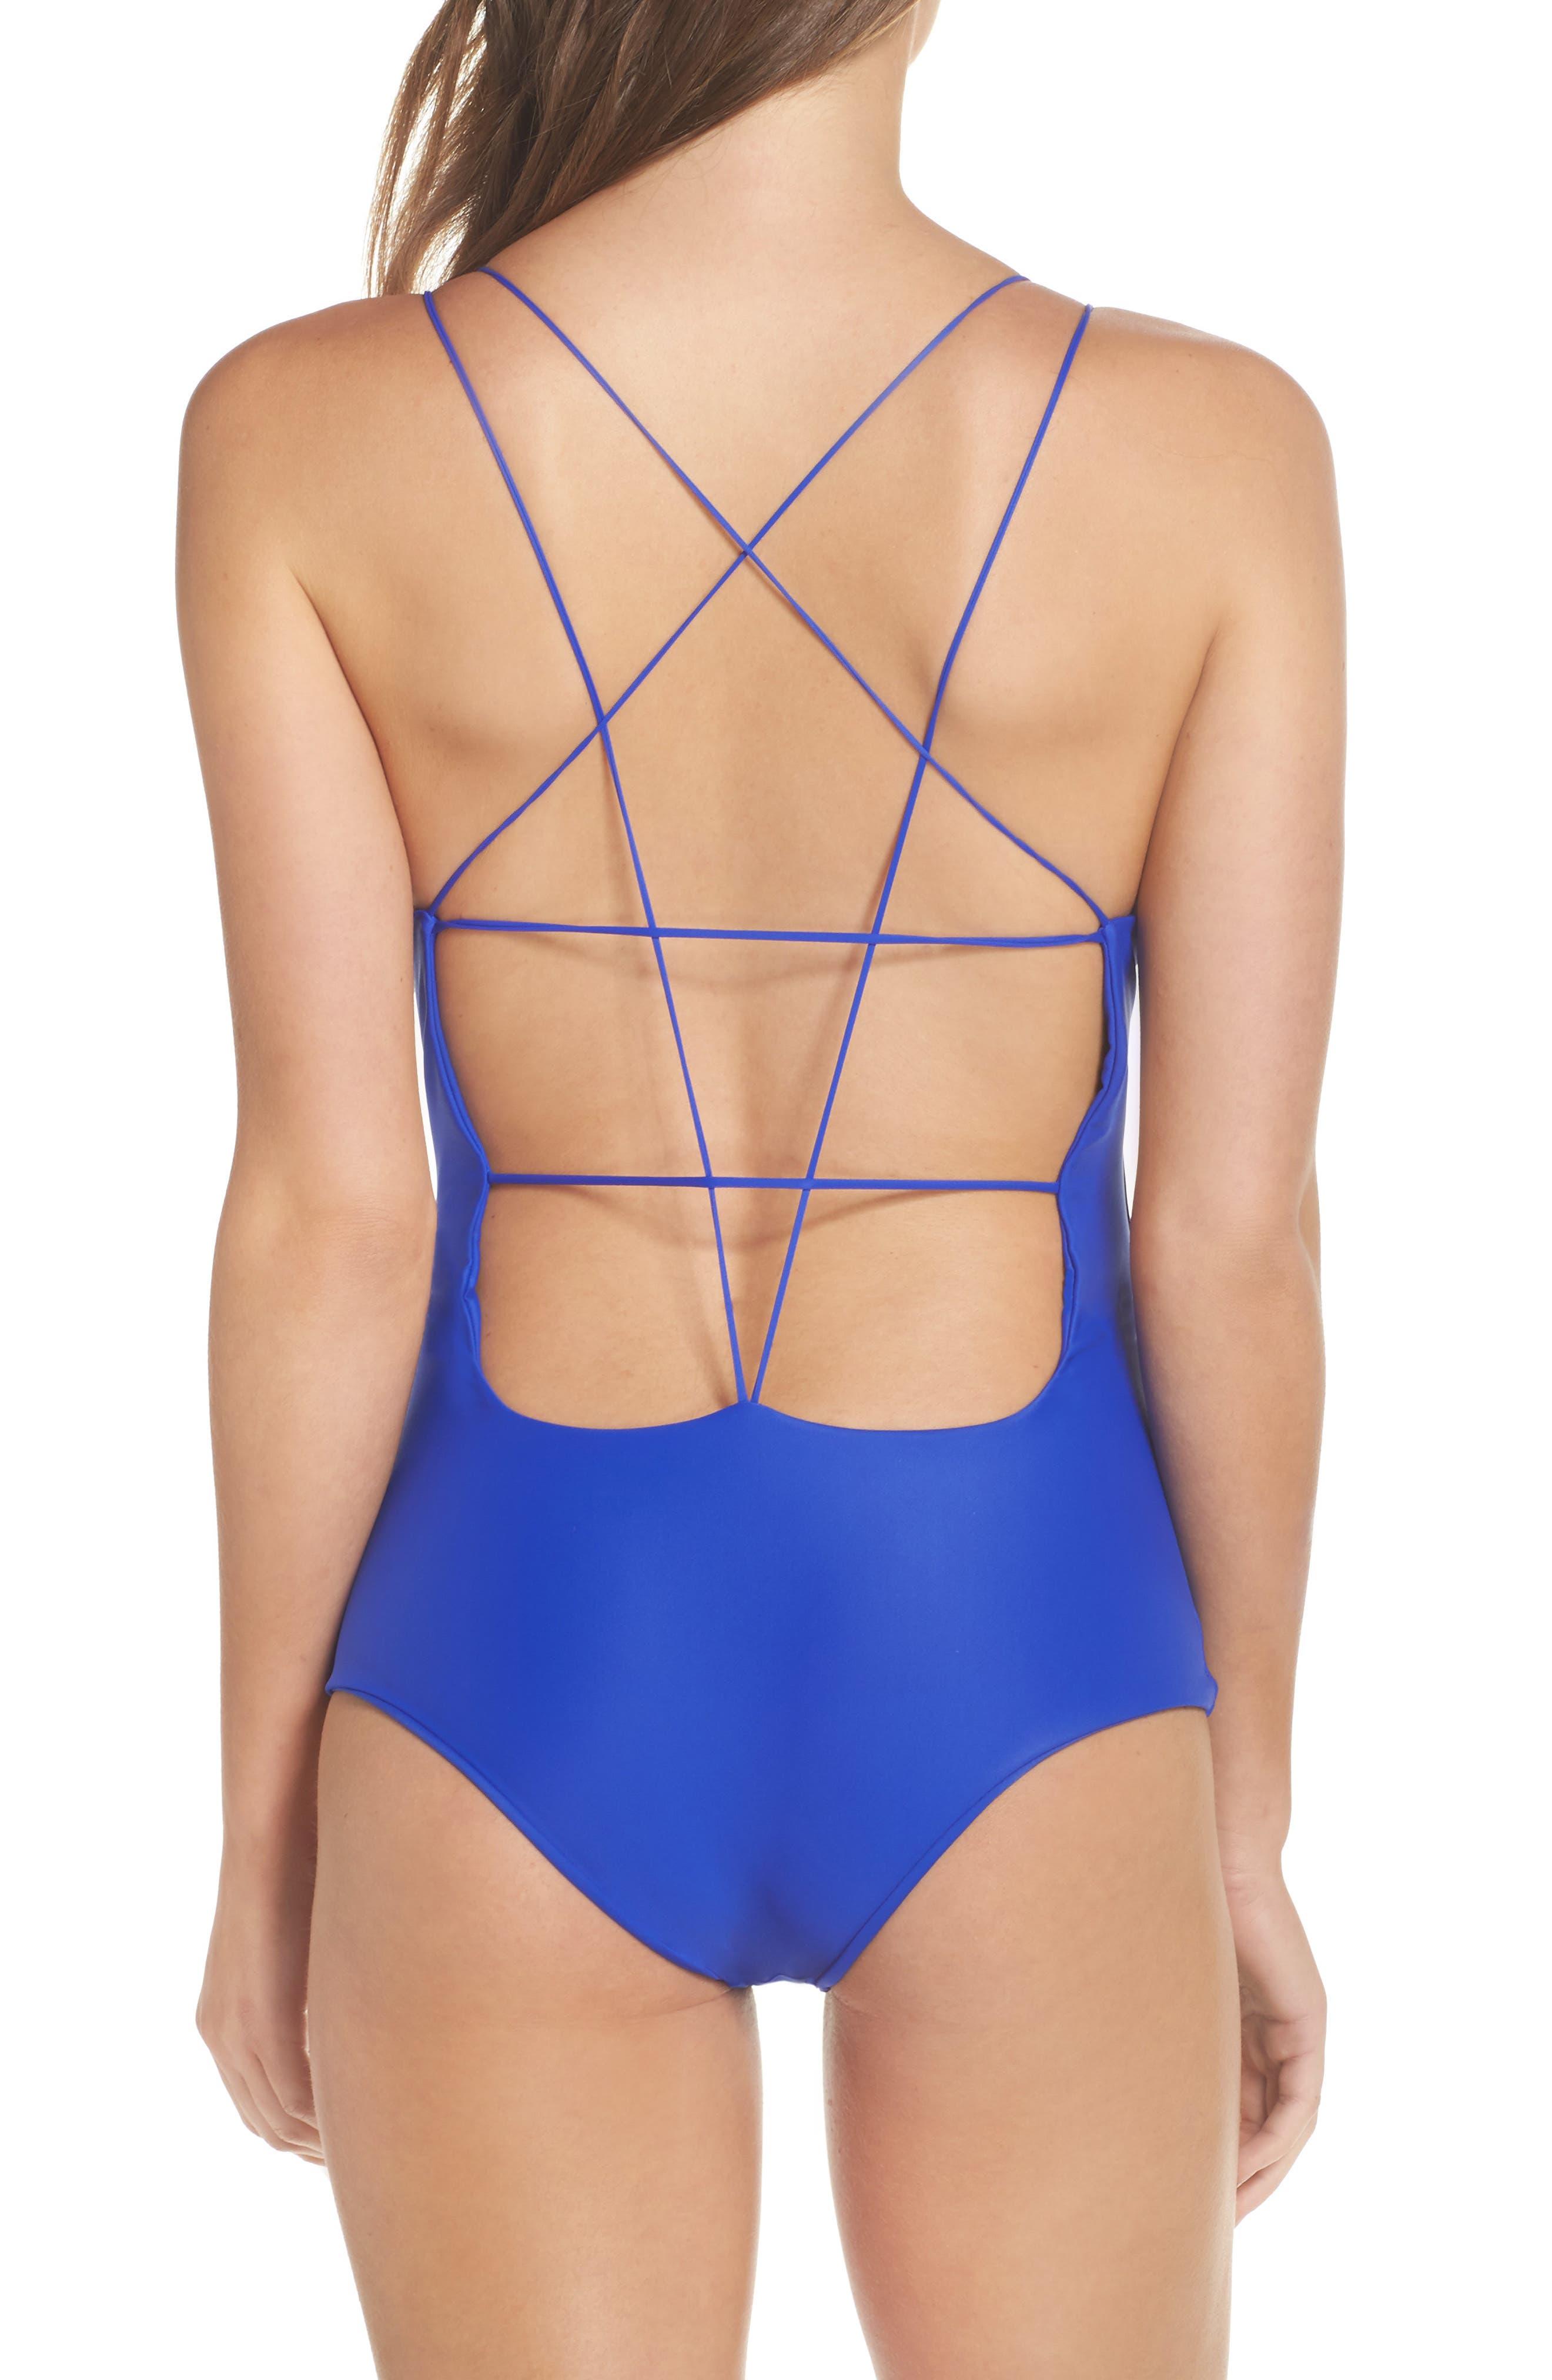 Alternate Image 2  - Mikoh Kilauea One-Piece Swimsuit